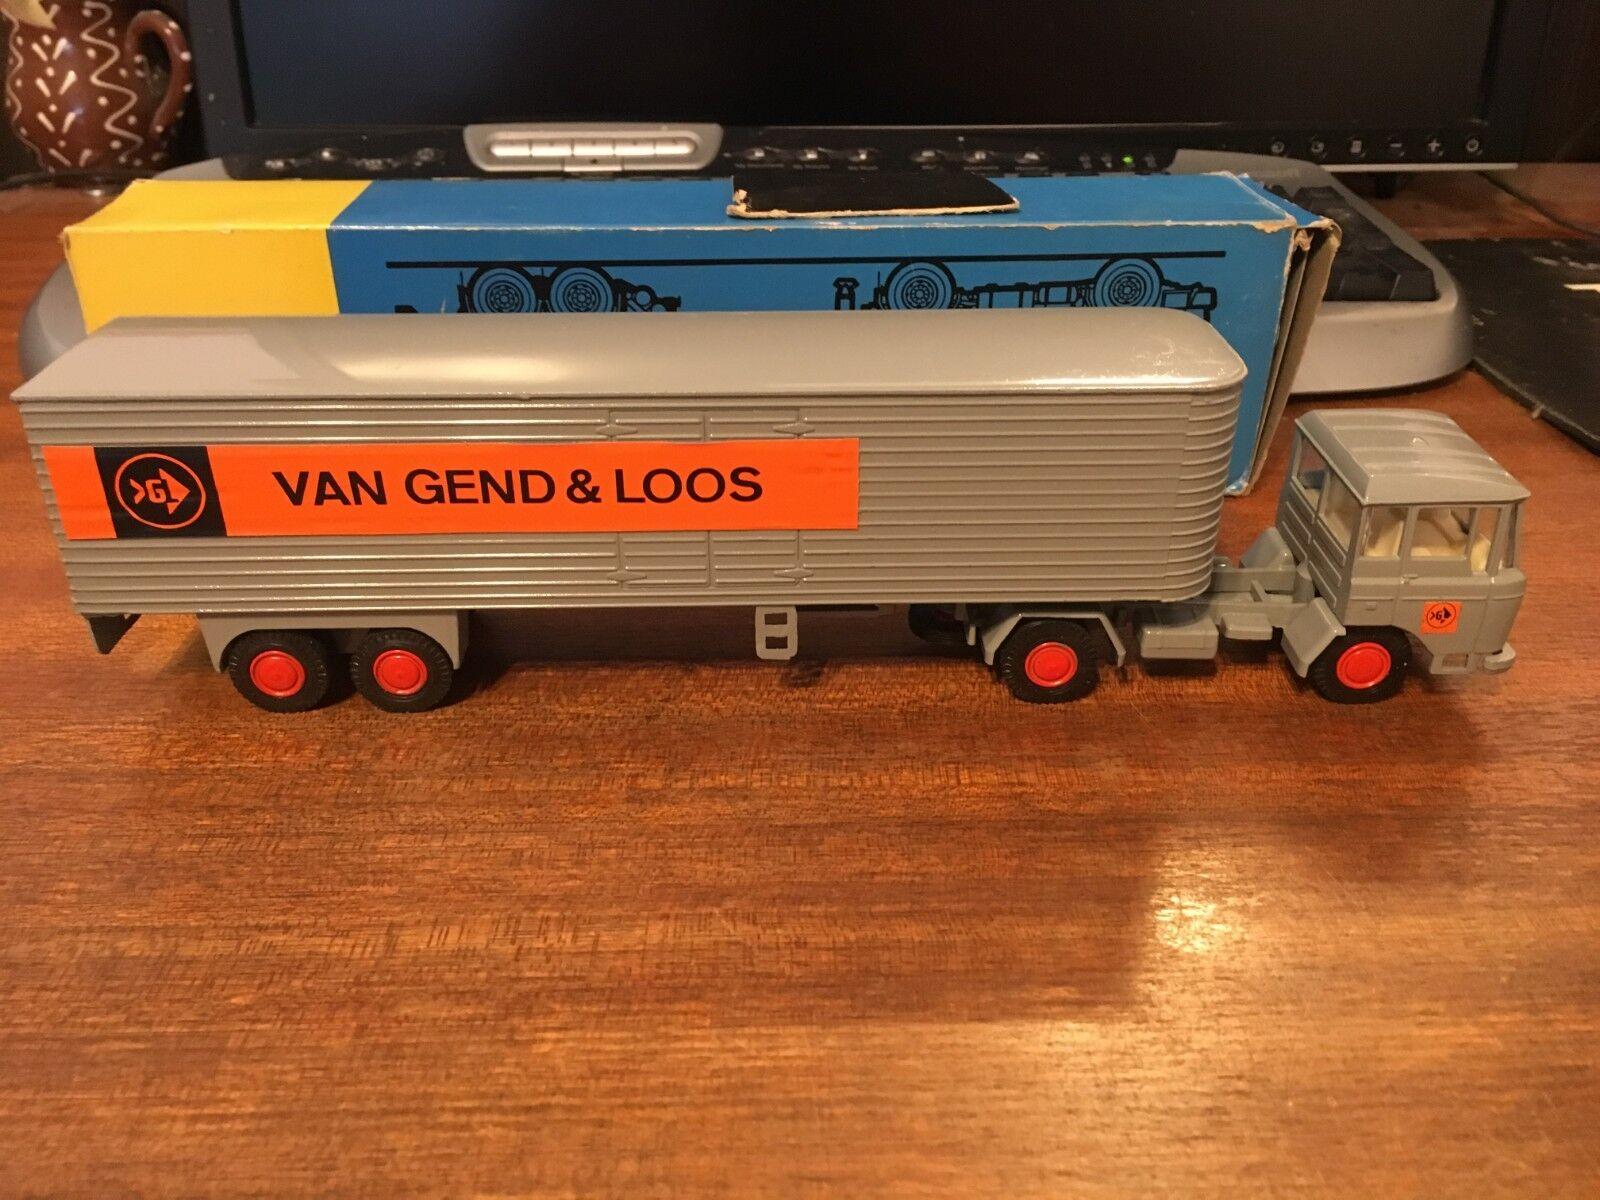 LION AUTO 1/50 SCALA Nr.36 DAF 2600 TREKKER eurotrailer-Van Leggenda & Loos